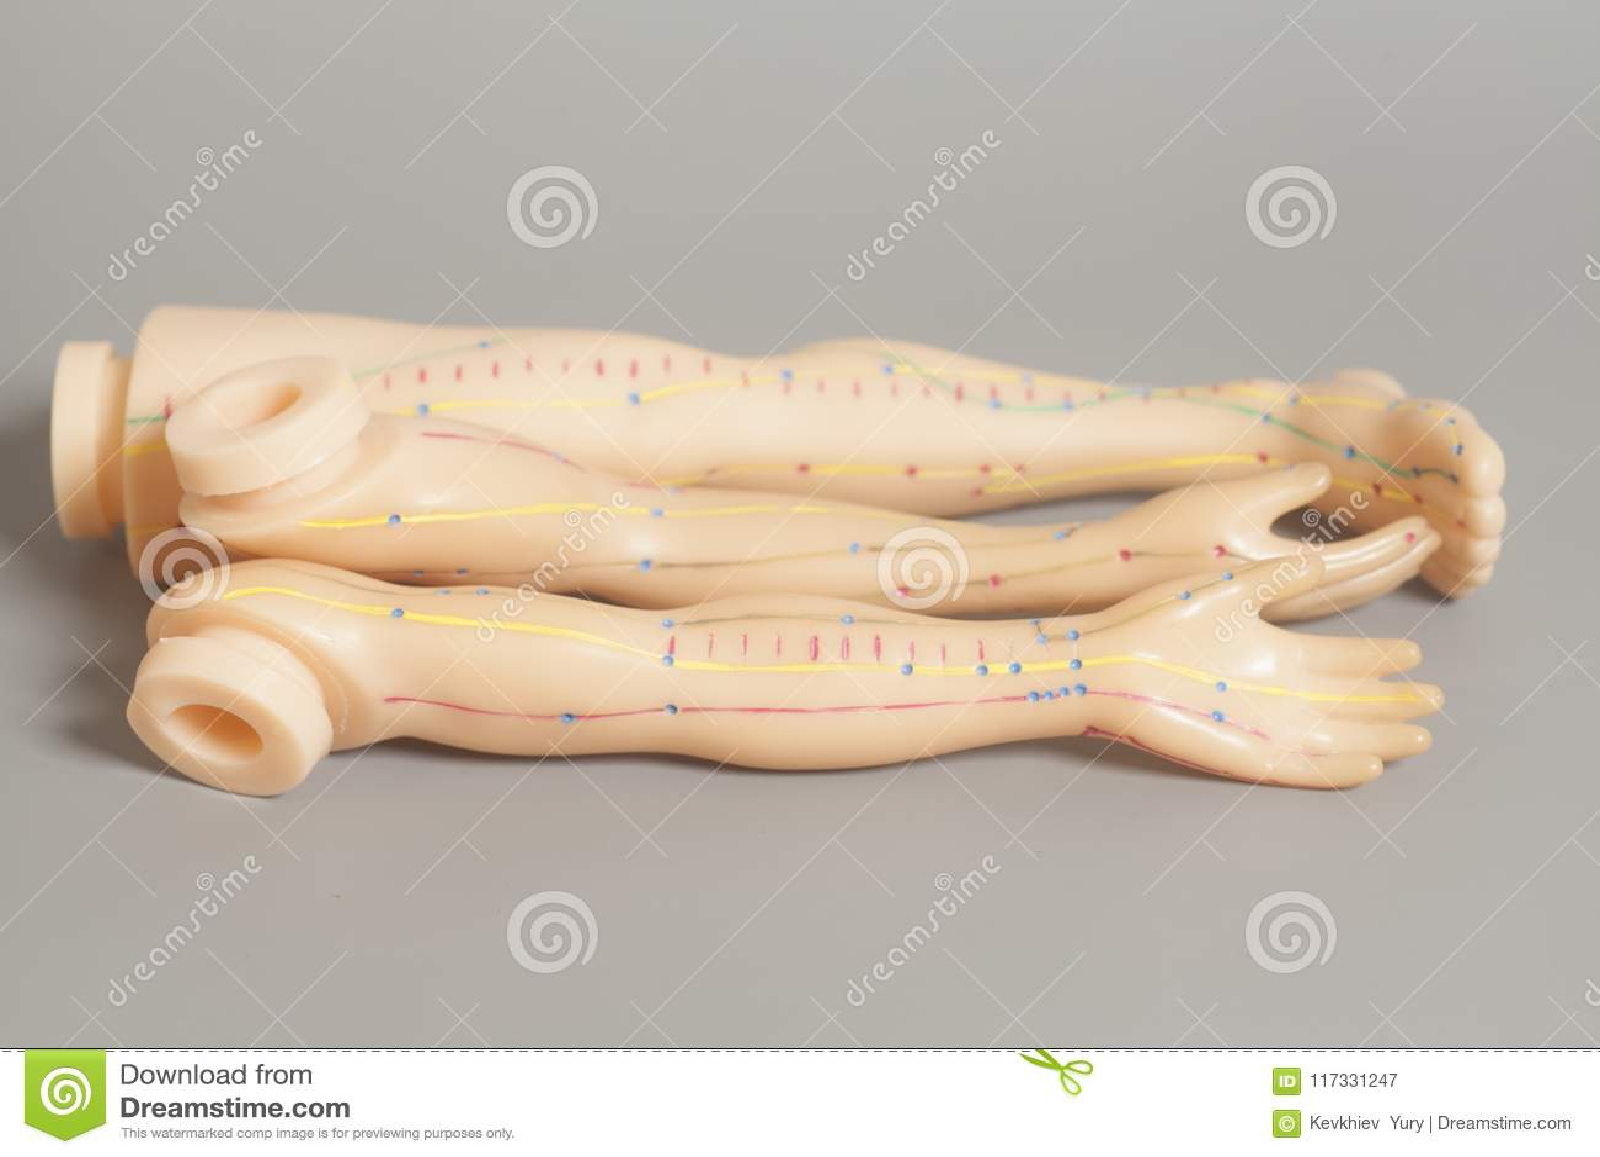 Human Body Parts Stock Photos - Royalty Free Images